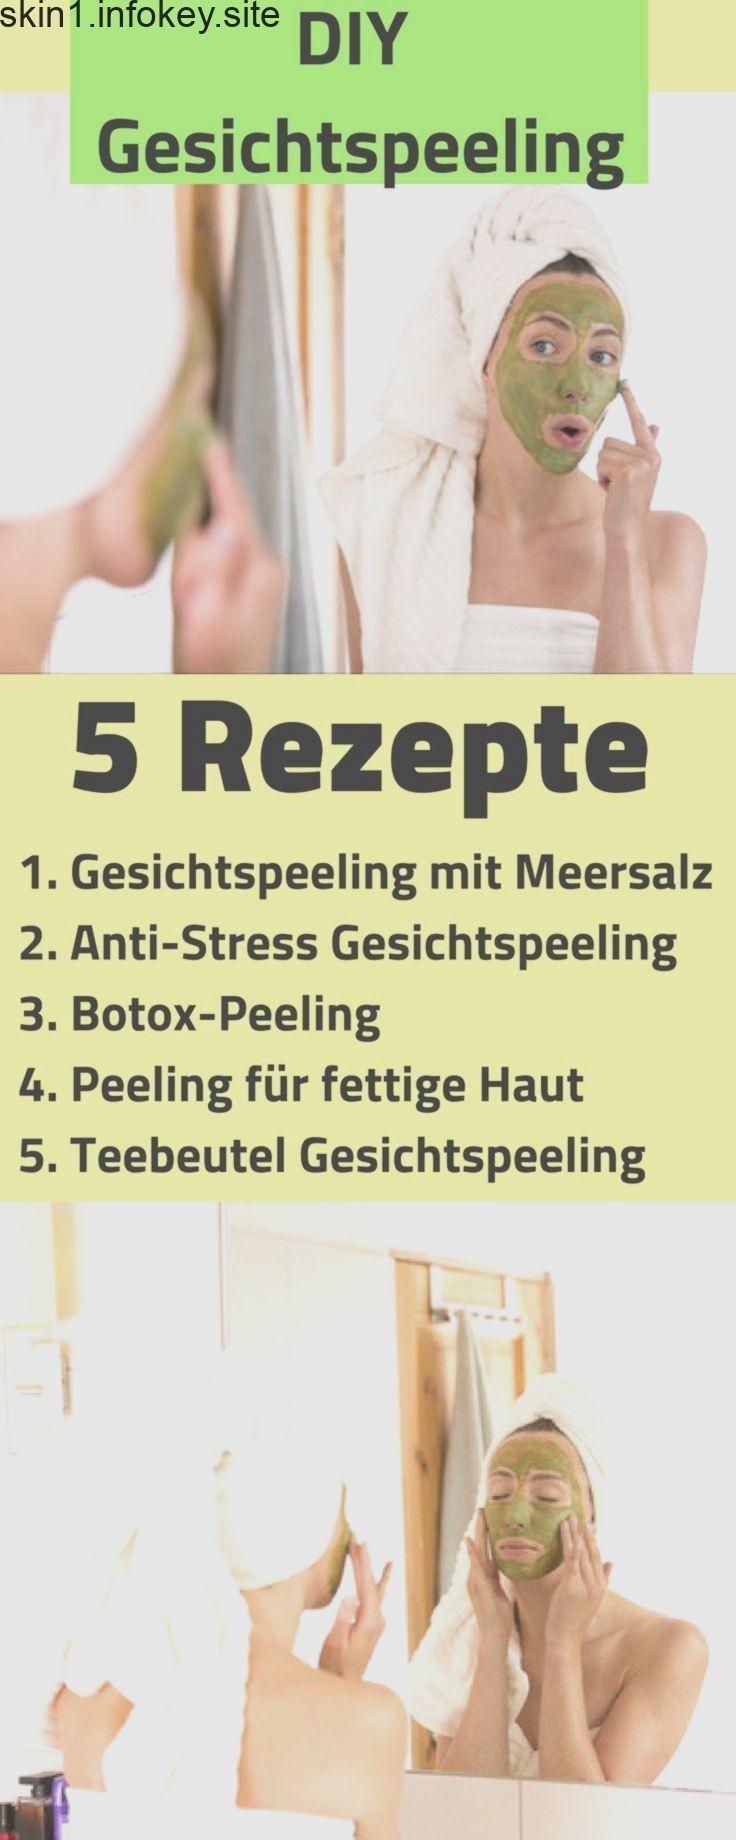 Types of Facial Peeling - 5 Easy Recipes ... -  Hautpflege-Rezepte